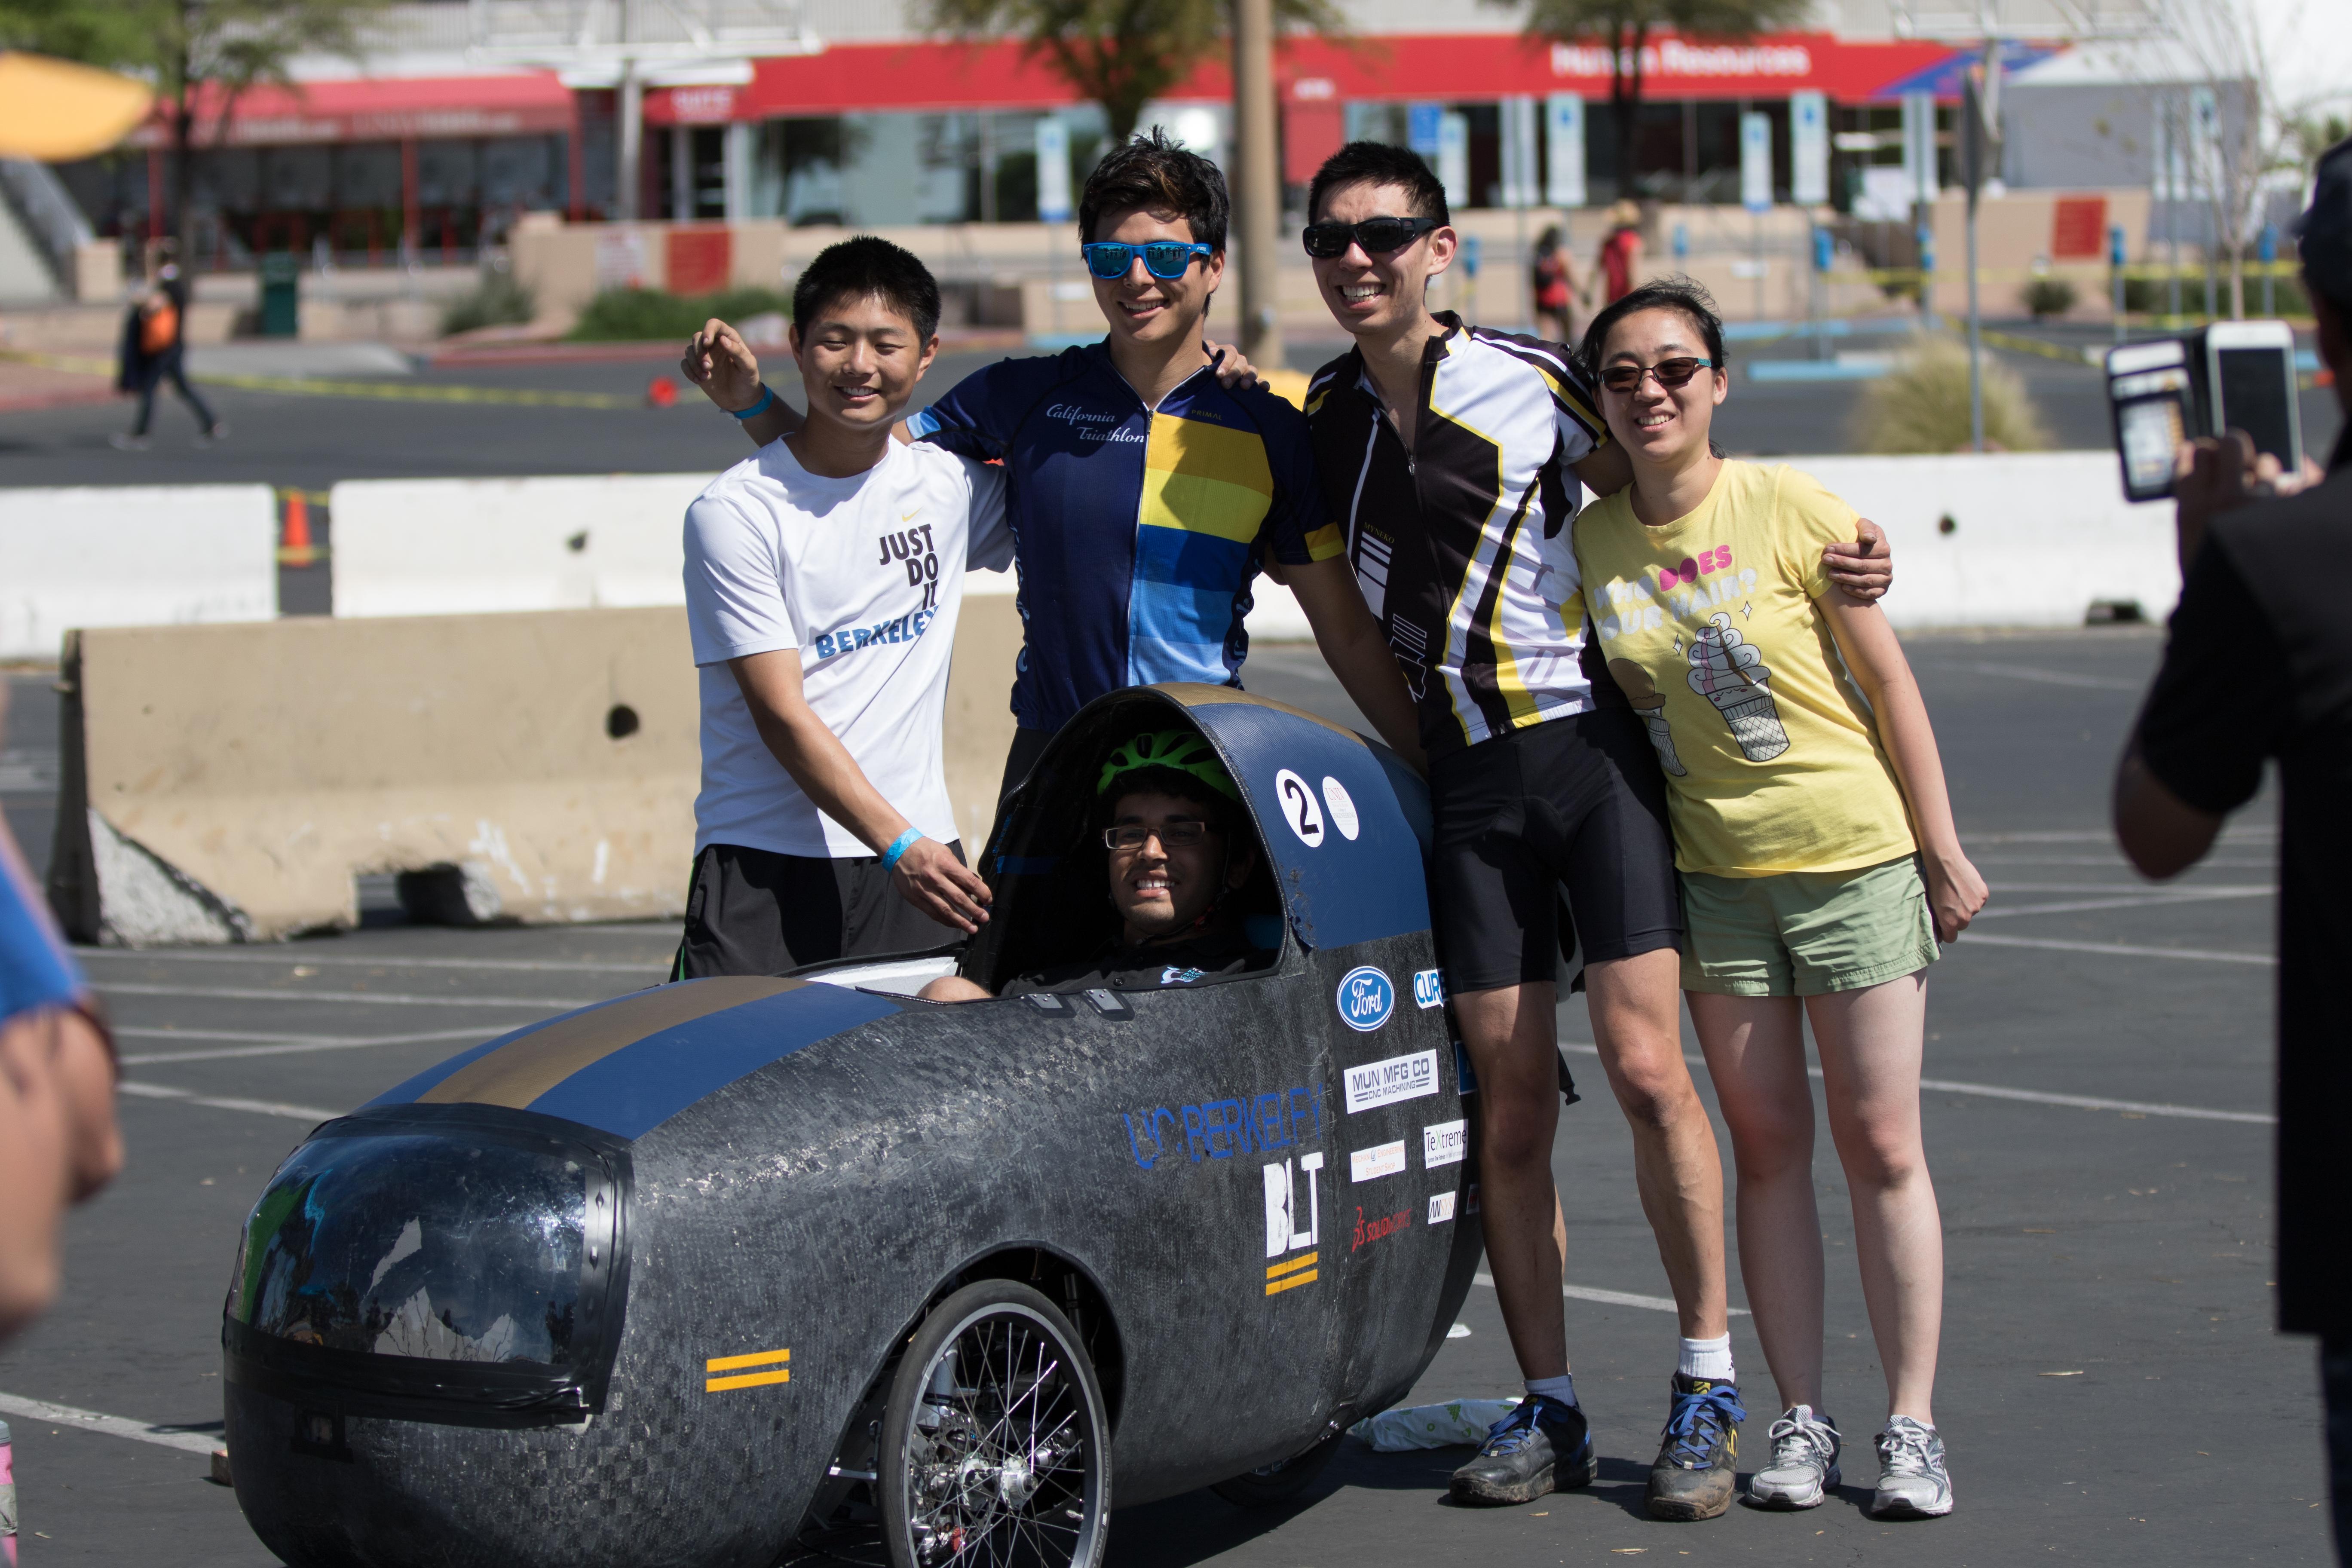 ridersgroupphoto.jpg